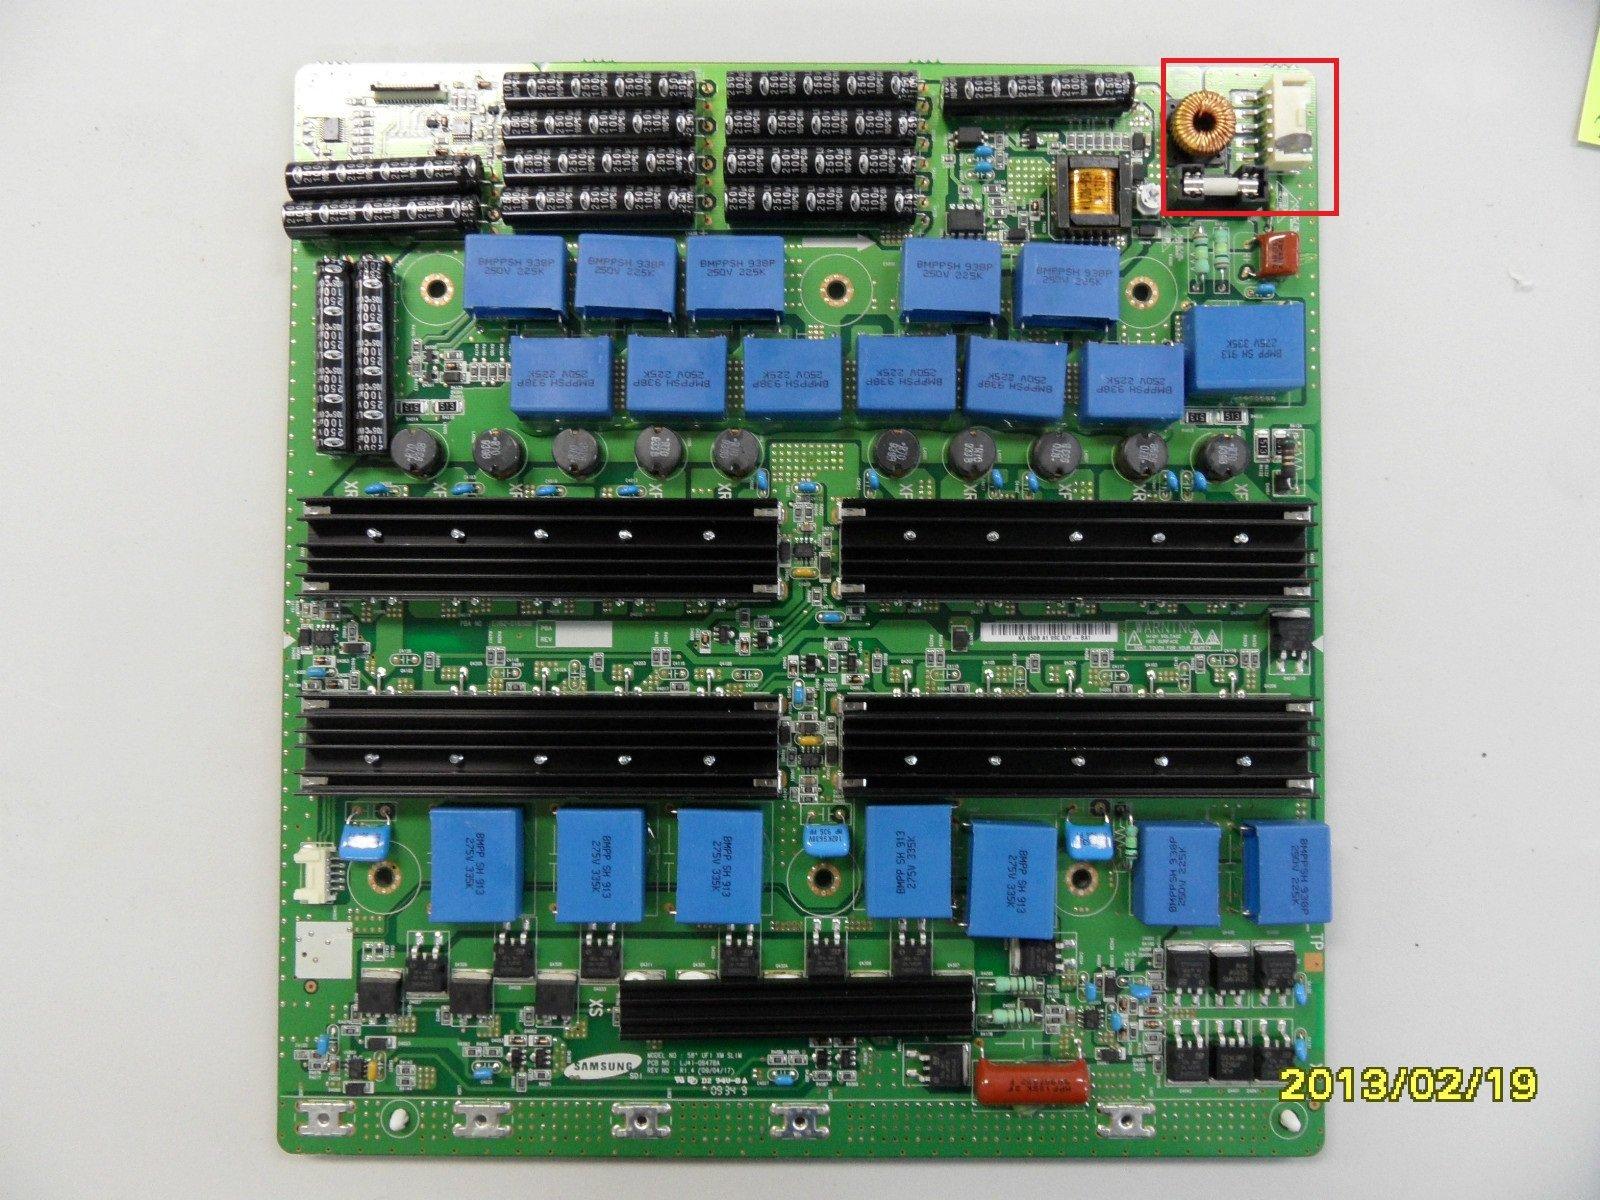 Processed By eBay with ImageMagick, R1.1.1.||B2||T0JKX0lEPTVjYTFhYjFlYTY1YTAyMzgwNTEyMGE1MzM5MjdjMTA1MTI3YTM3MTQyYzRhfHxTRUxMRVJfTkFNRT1uaWdodF9leWVzX3R2fHxPUklHSU5BTF9FQkFZX1FVQUxJVFlfU0NPUkU9NHx8Q1JFQVRJT05fREFURT0zLzYvMTMgMzozOSBQTQ==